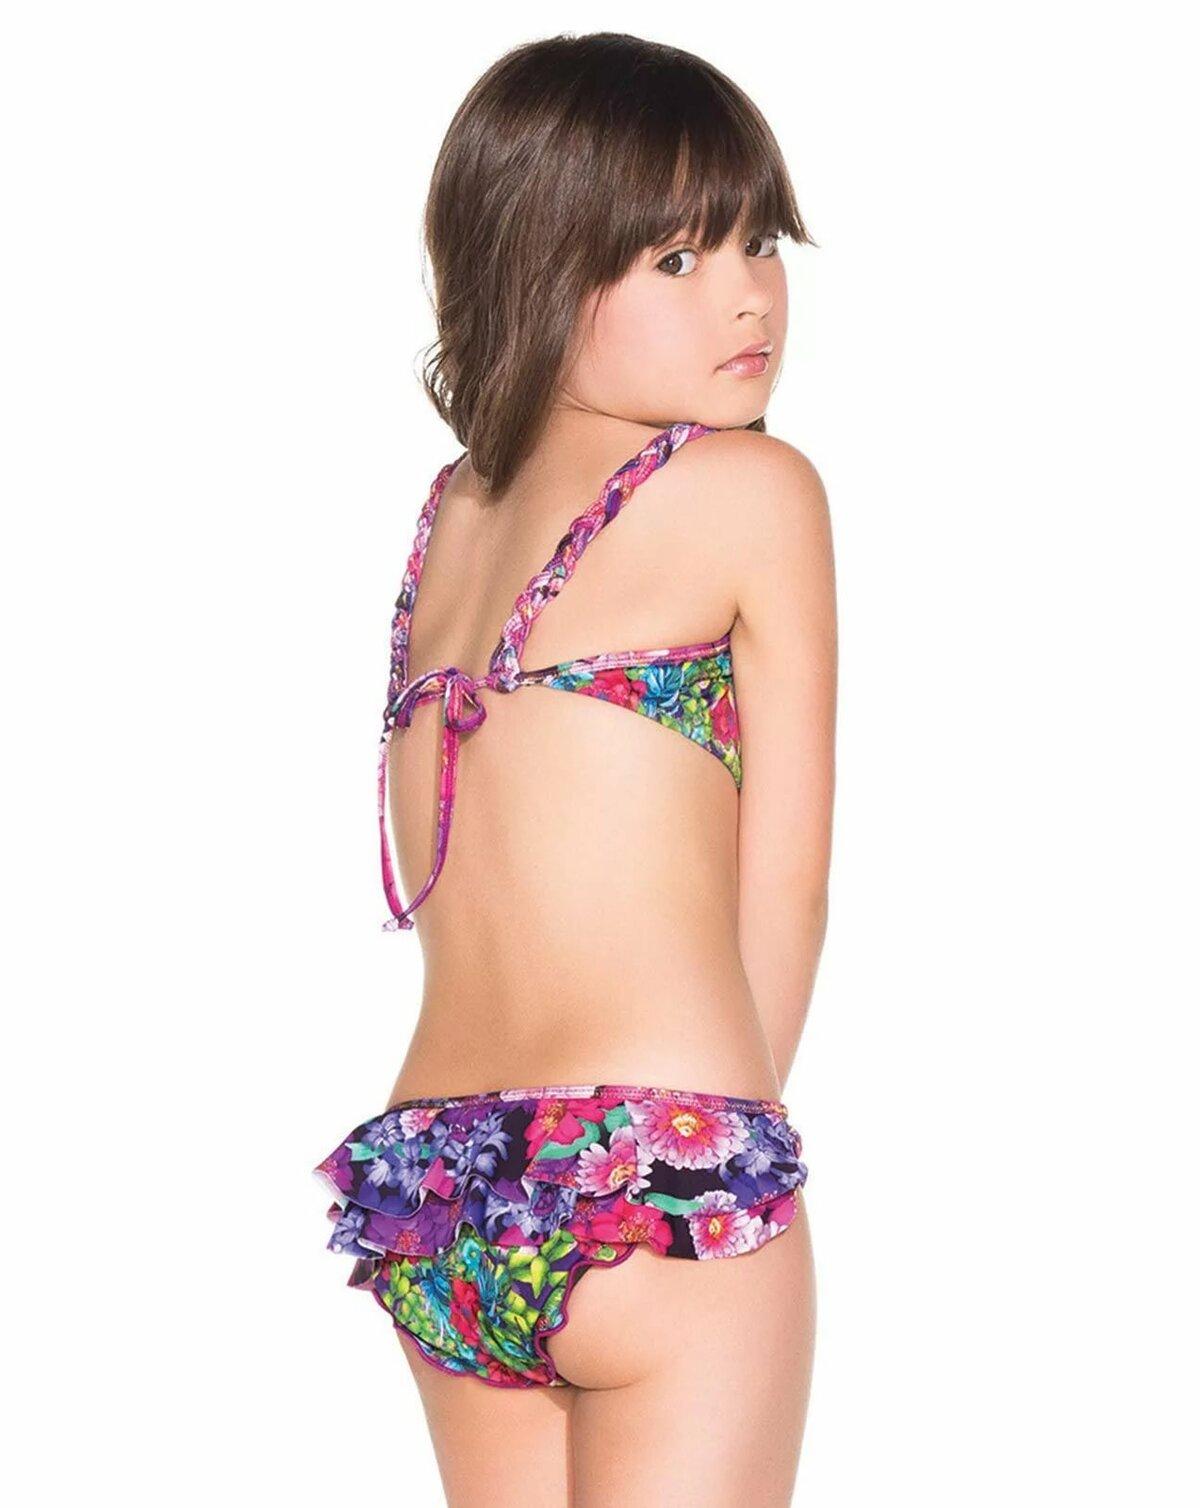 Pre pubesent girls in bikini menstral